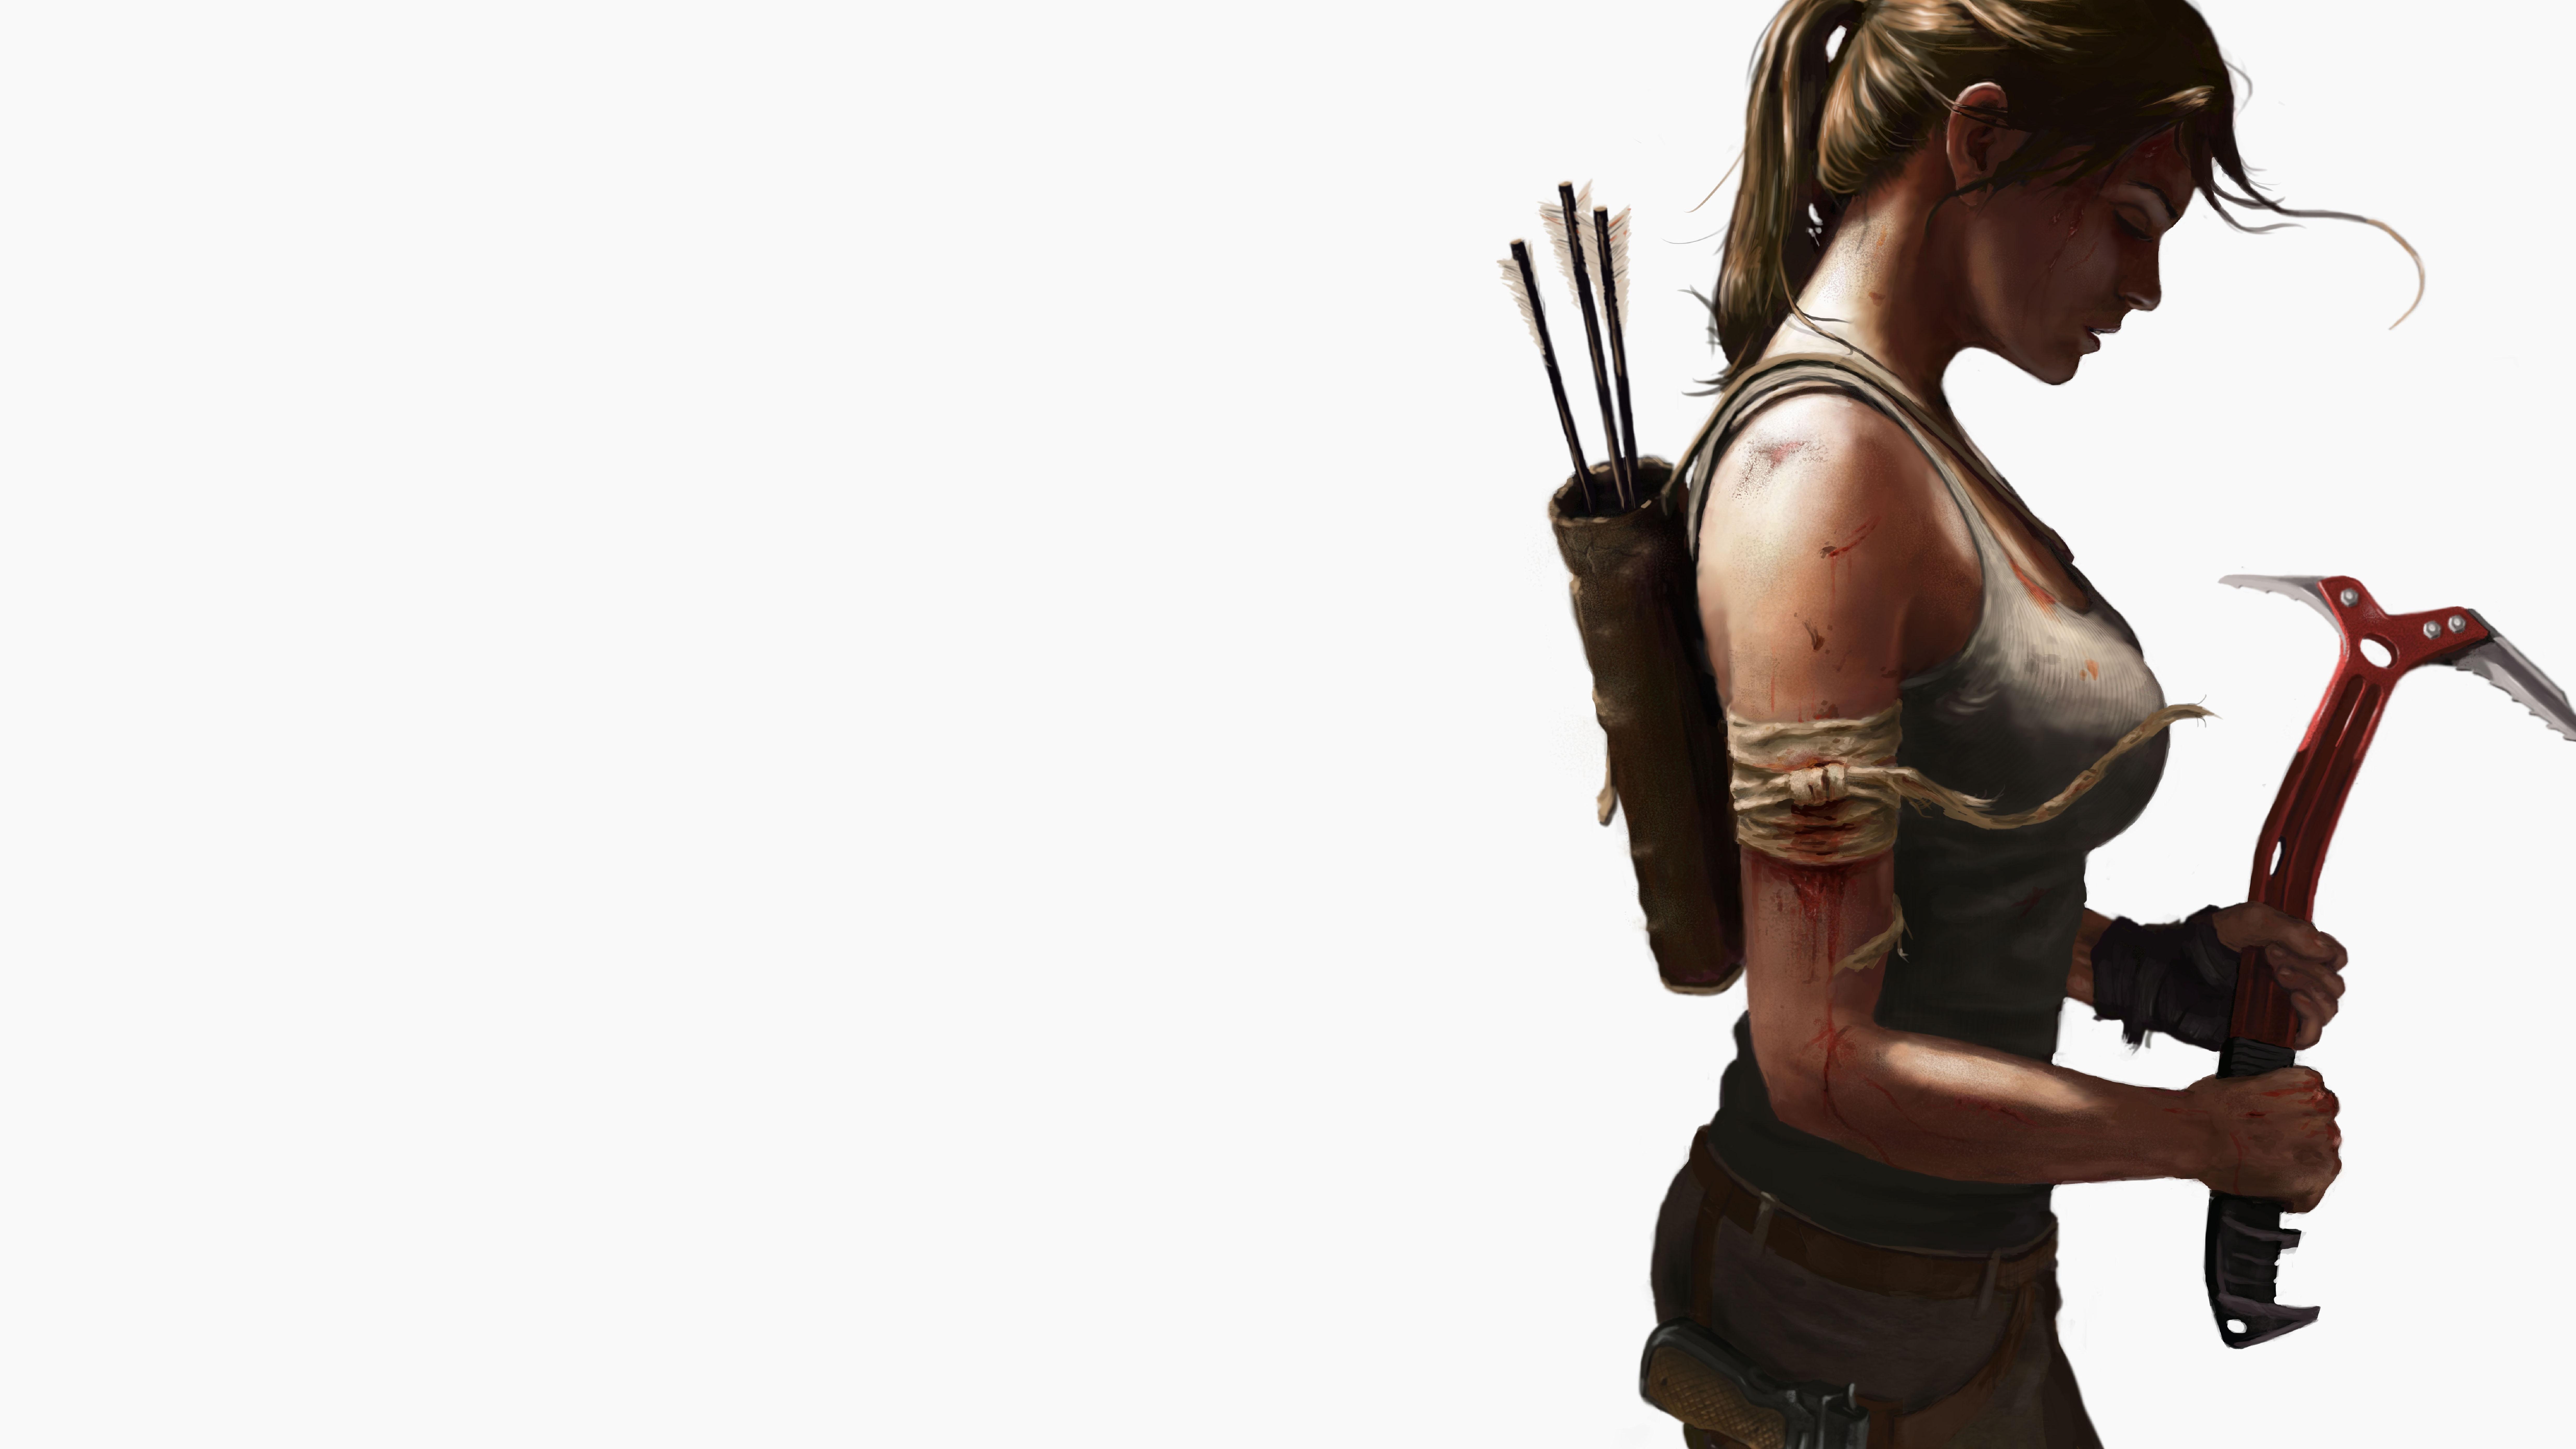 3840x2160 Lara Croft Tomb Raider Artwork 4k Hd 4k: 8k Tomb Raider Lara Croft, HD Games, 4k Wallpapers, Images